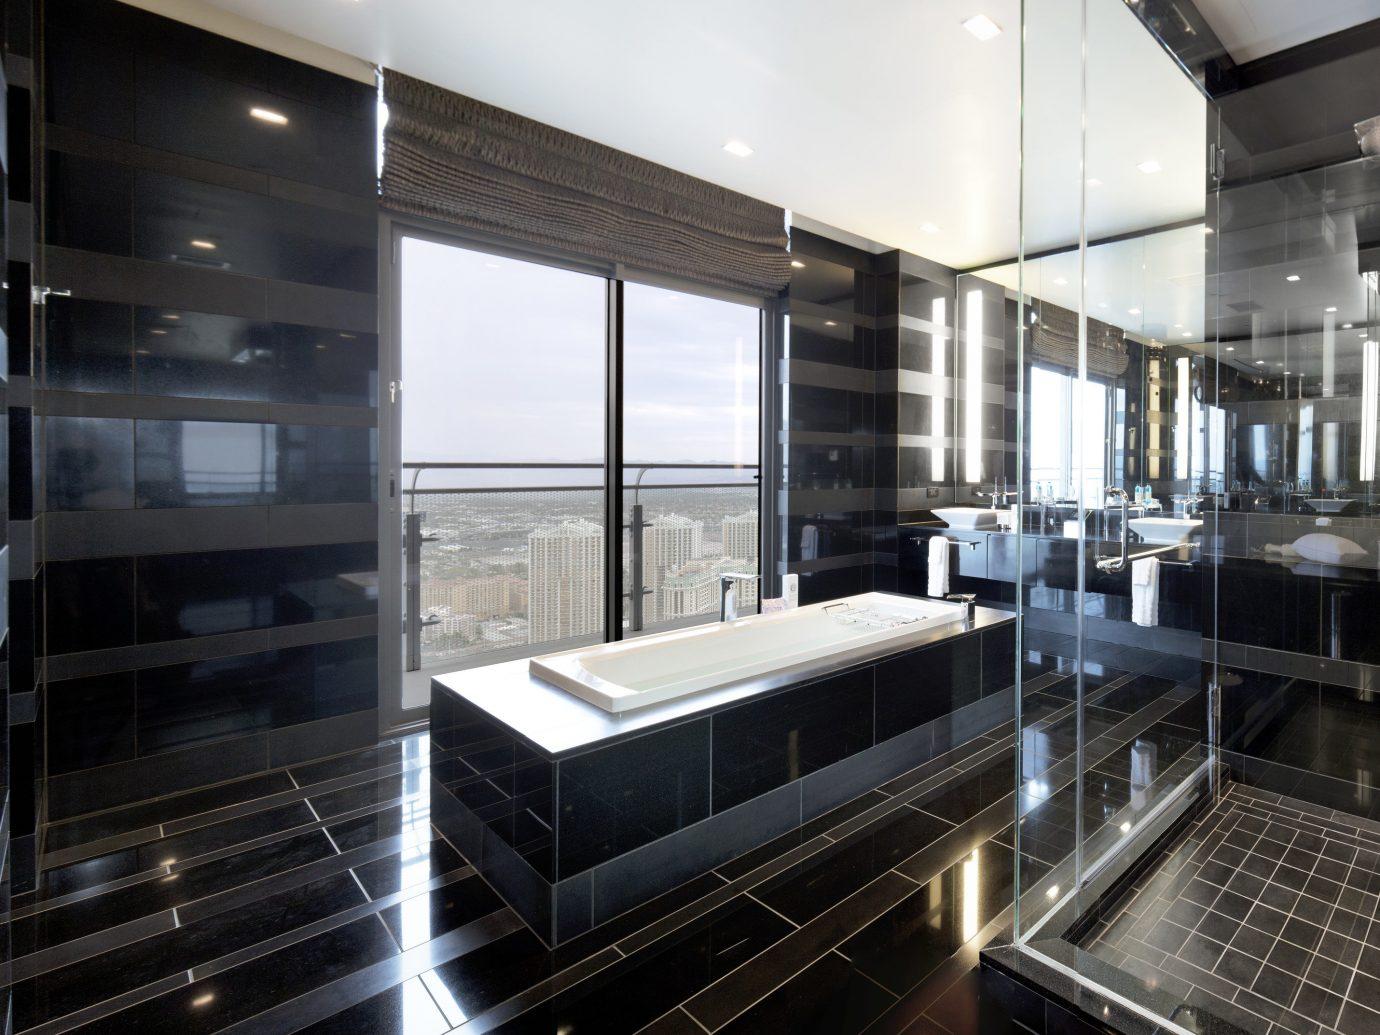 Bathtub overlooking las vegas in the Bentel & Bentel Penthouse Suites, The Cosmopolitan of Las Vegas